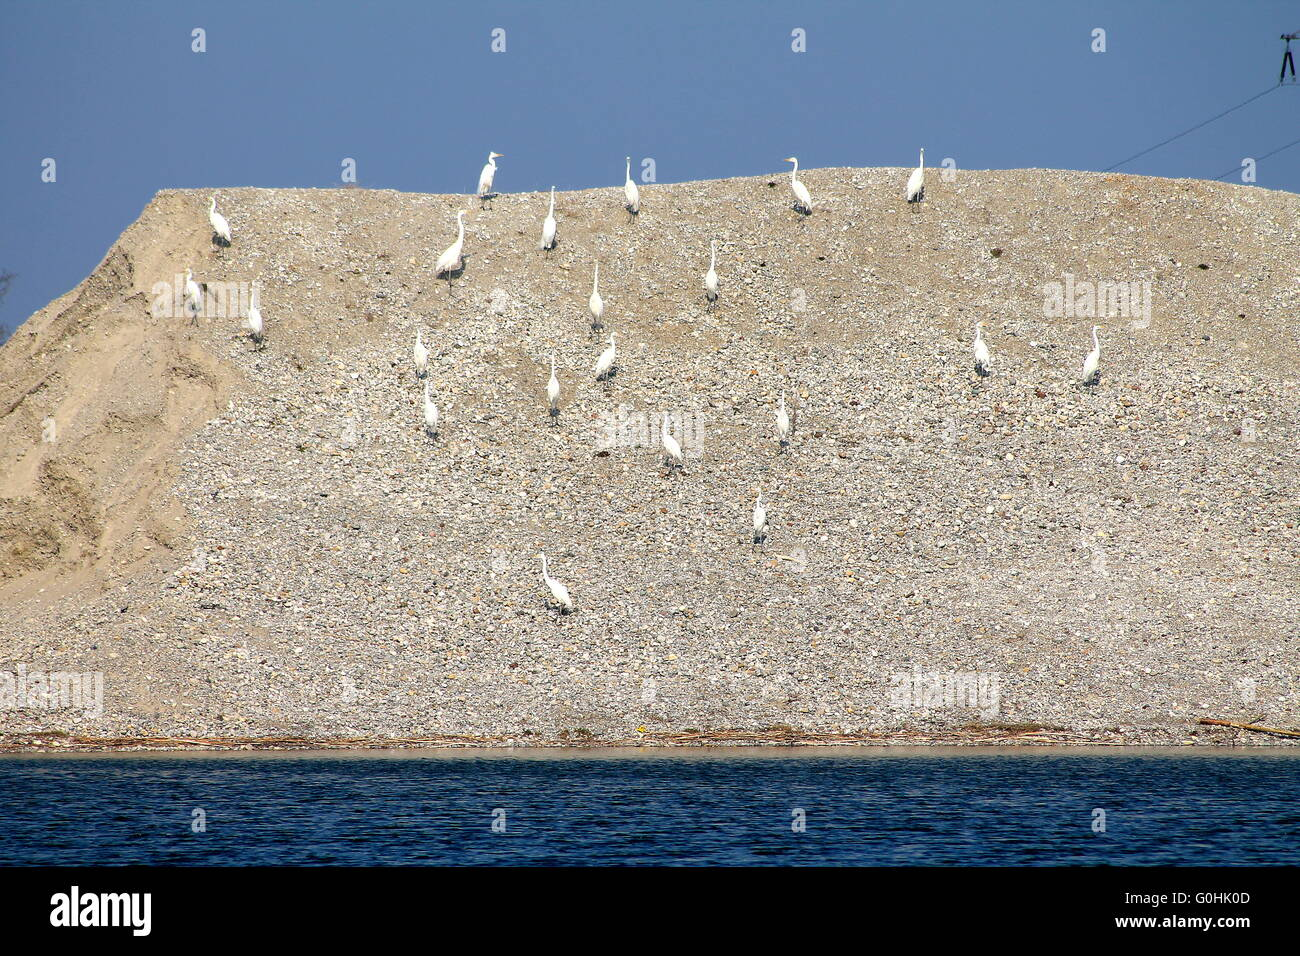 Egret colony at Lake Stock Photo